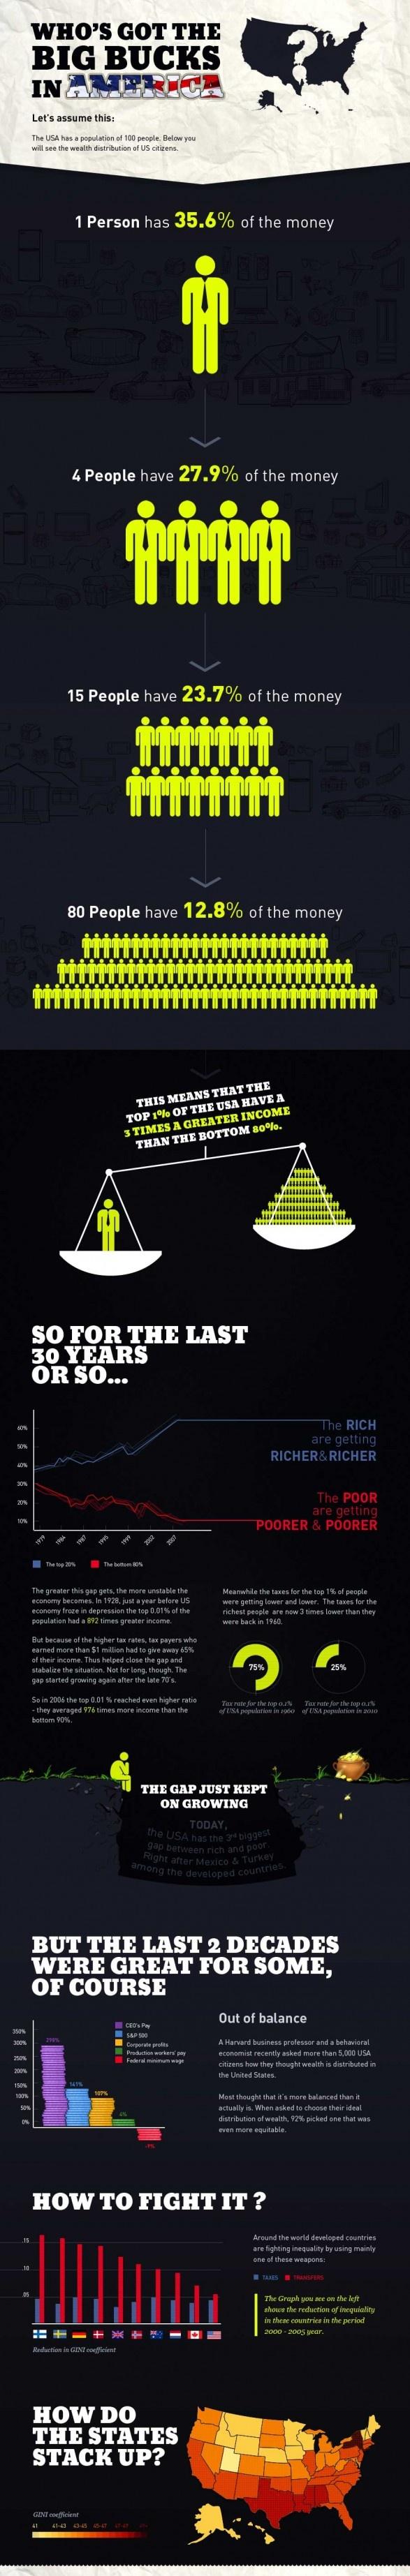 Wealth and Inequality in the United States - Richesse et des inégalités aux États-Unis